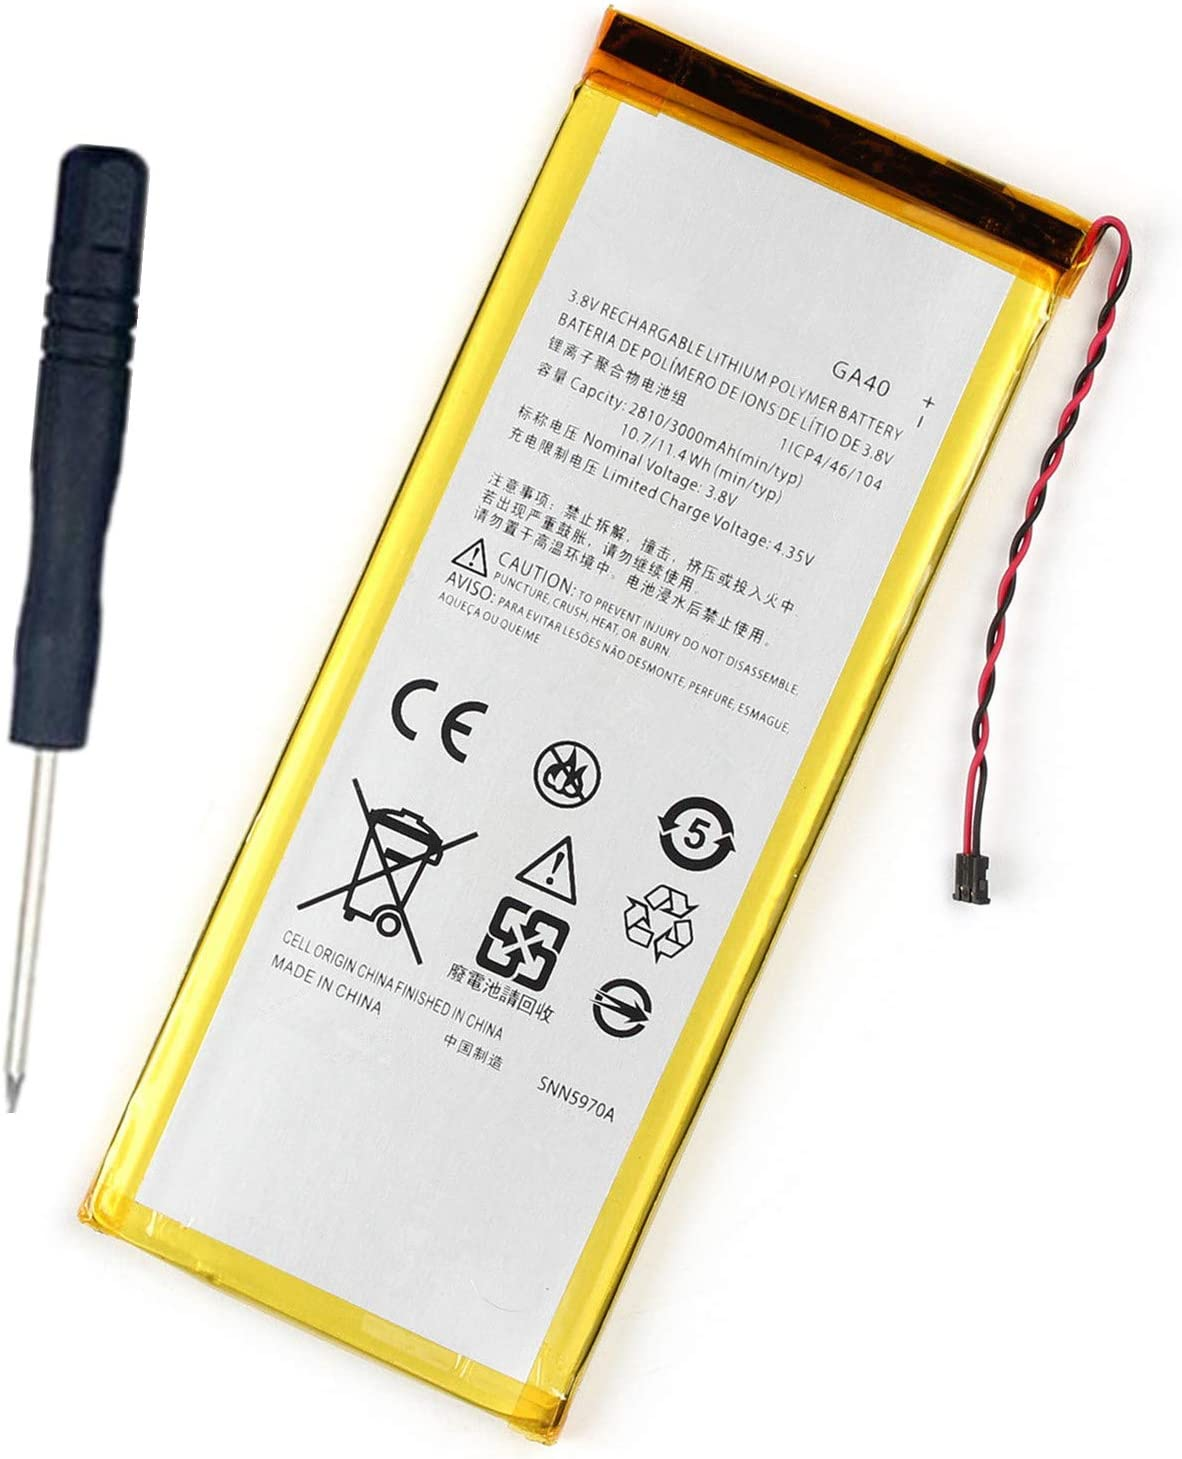 XT1622 XT1644 XT1642 XT1641 G4 Plus Bateria para Motorola Moto G4 // GA40